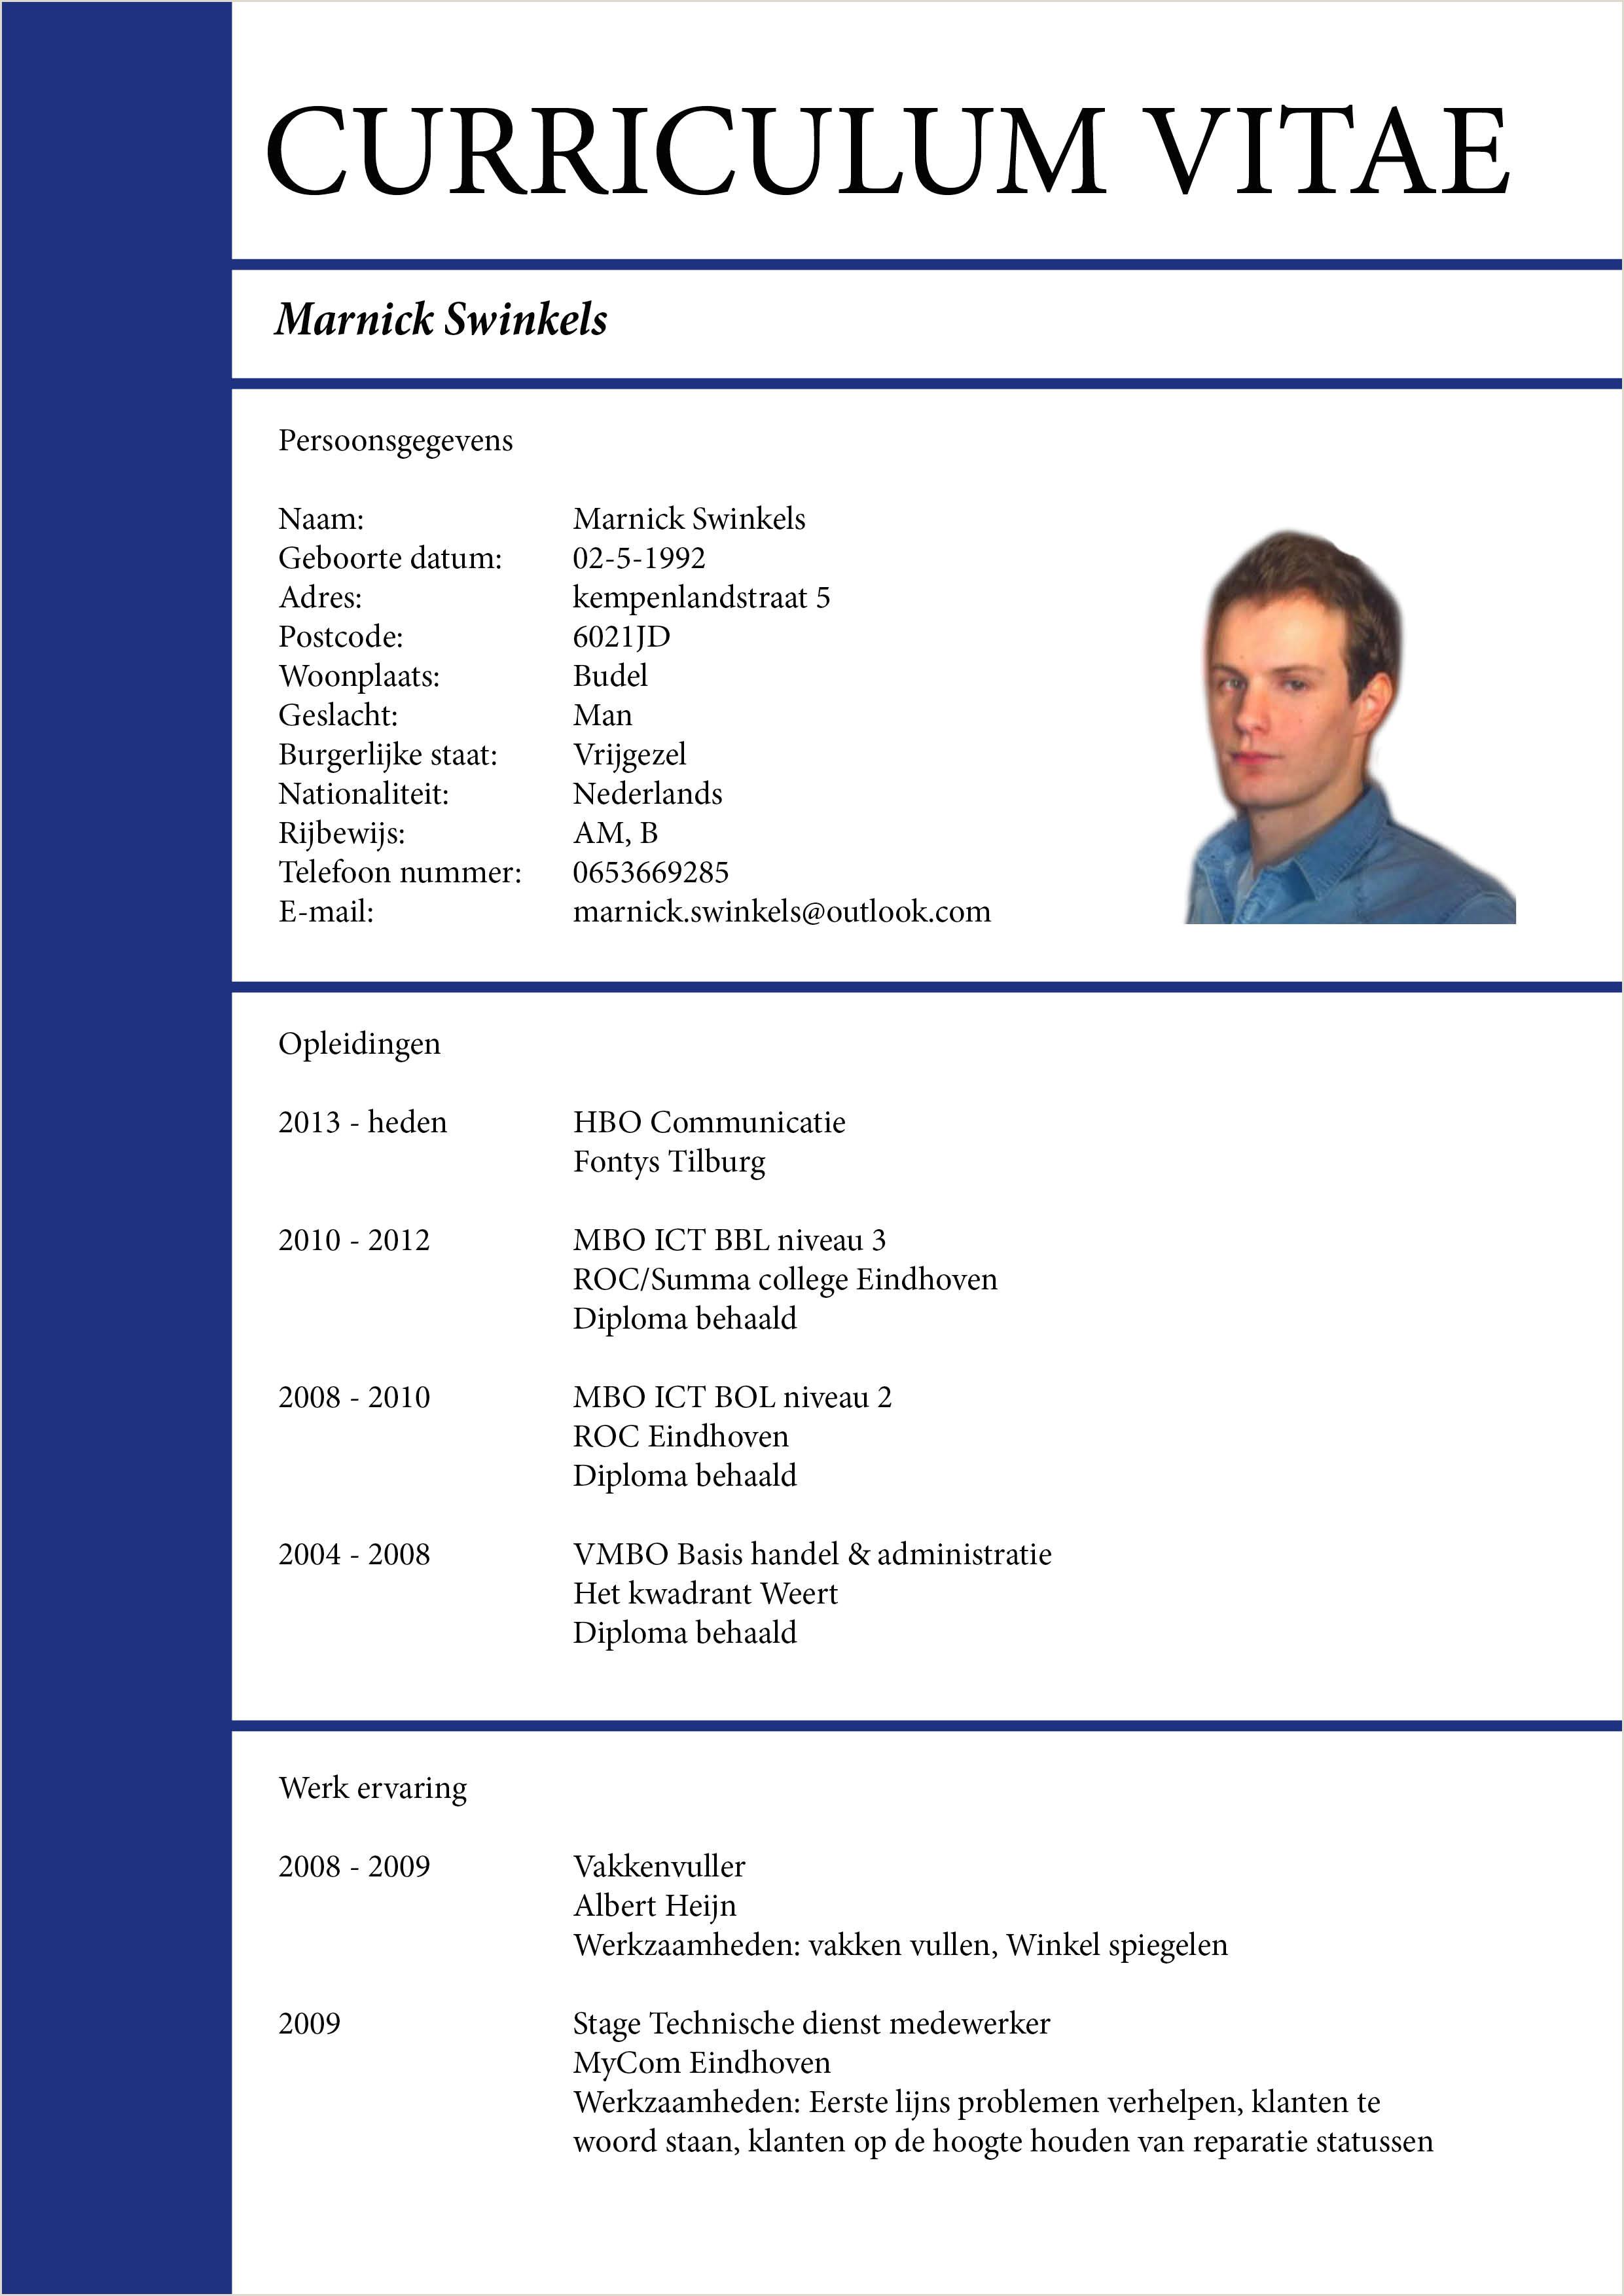 Curriculum Vitae Modelo Para Rellenar En Word 19 Fresh Curriculum Vitae formato Vacio